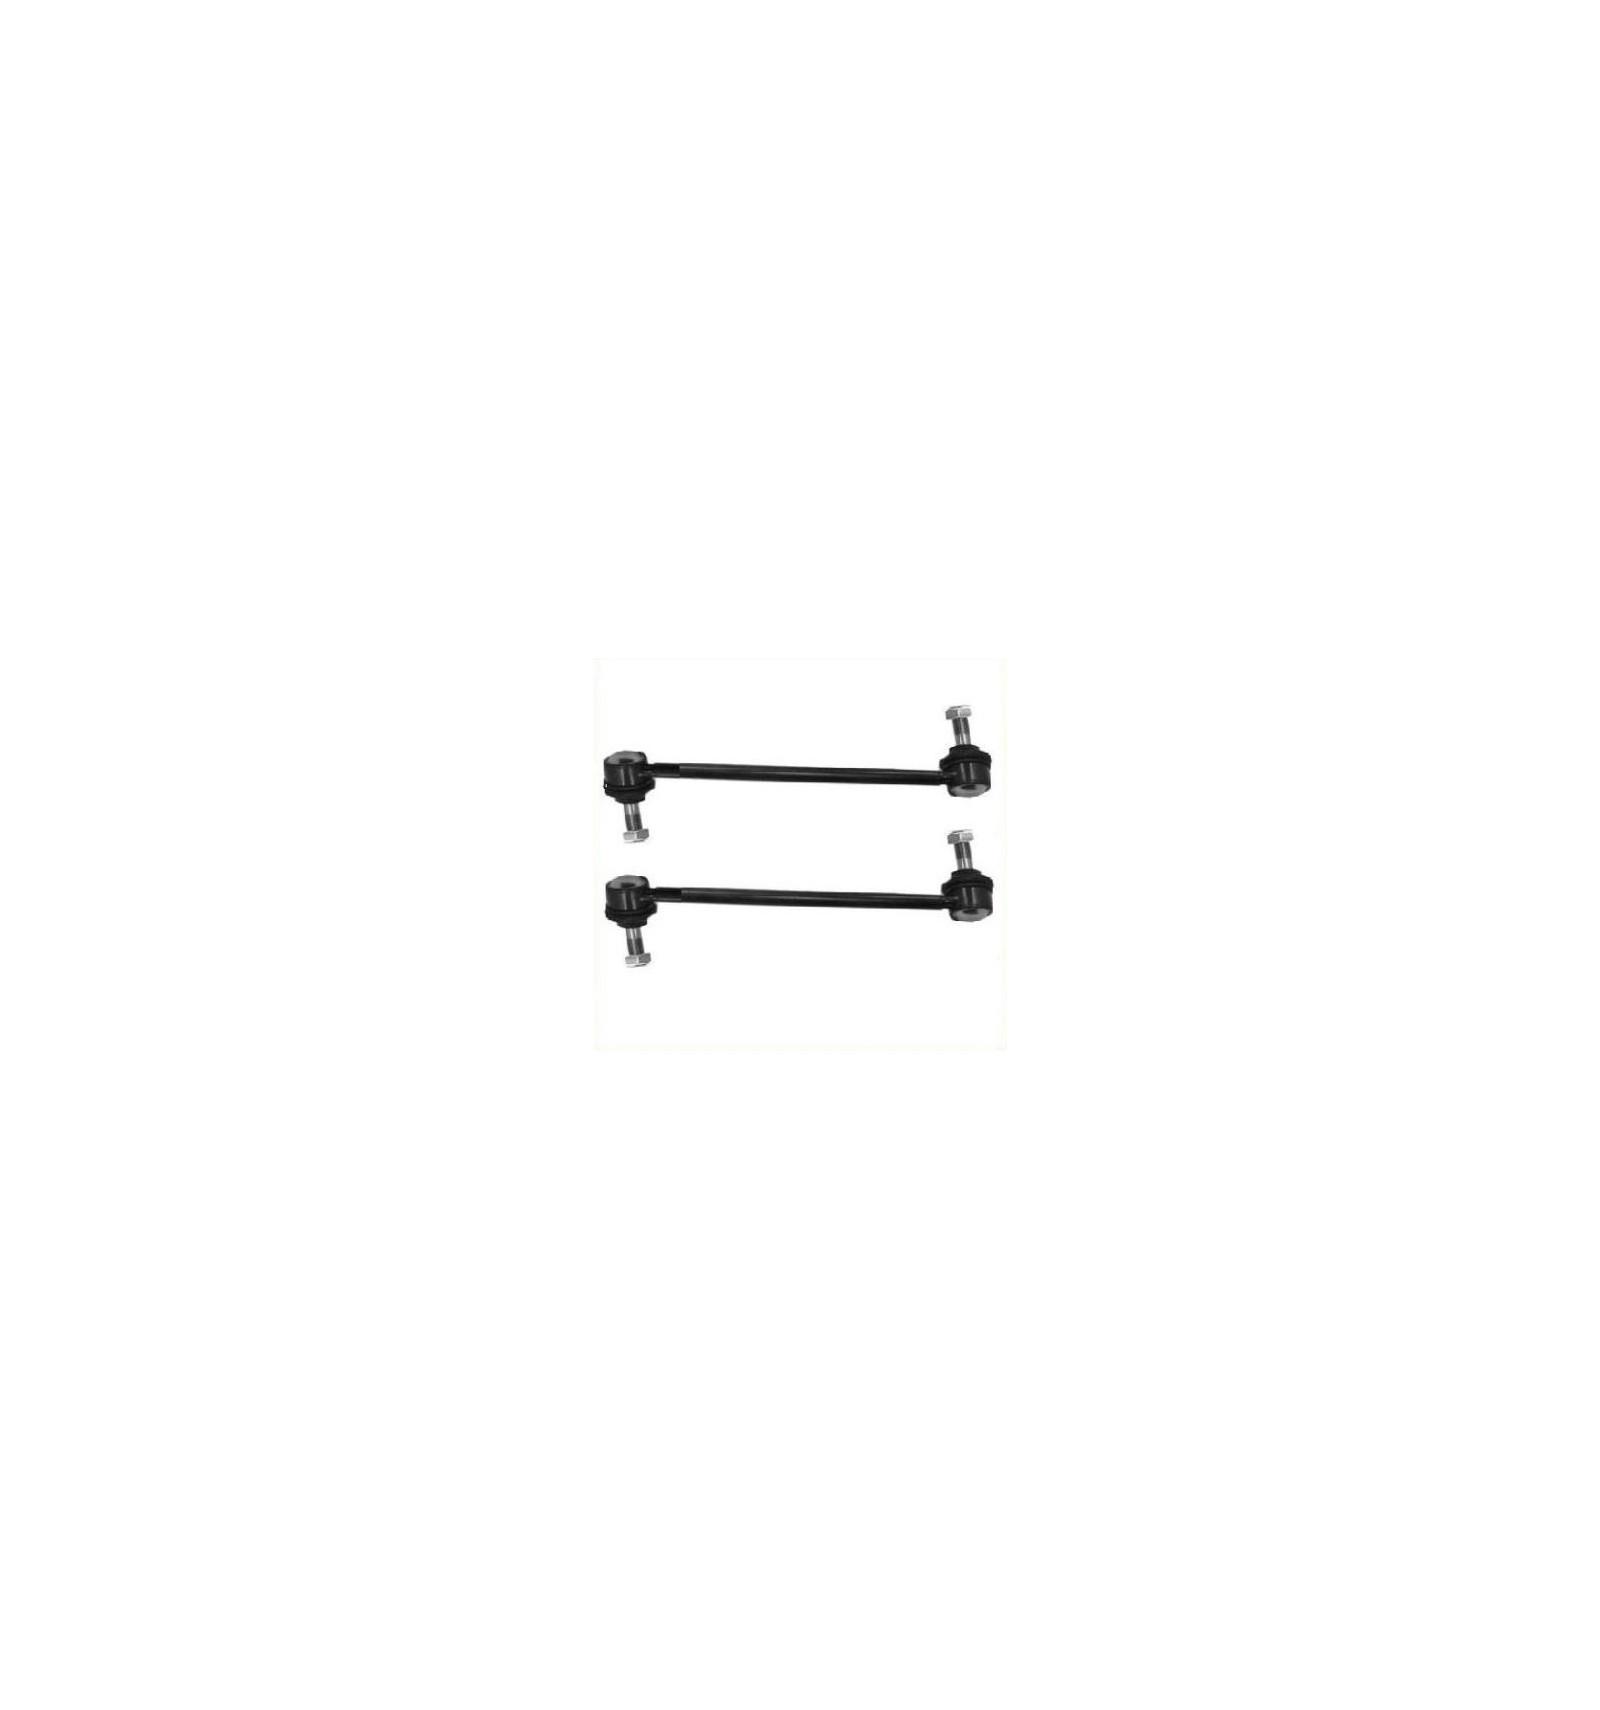 lot de 2 biellettes de barre stabilisatrice peugeot 307 citroen c4. Black Bedroom Furniture Sets. Home Design Ideas